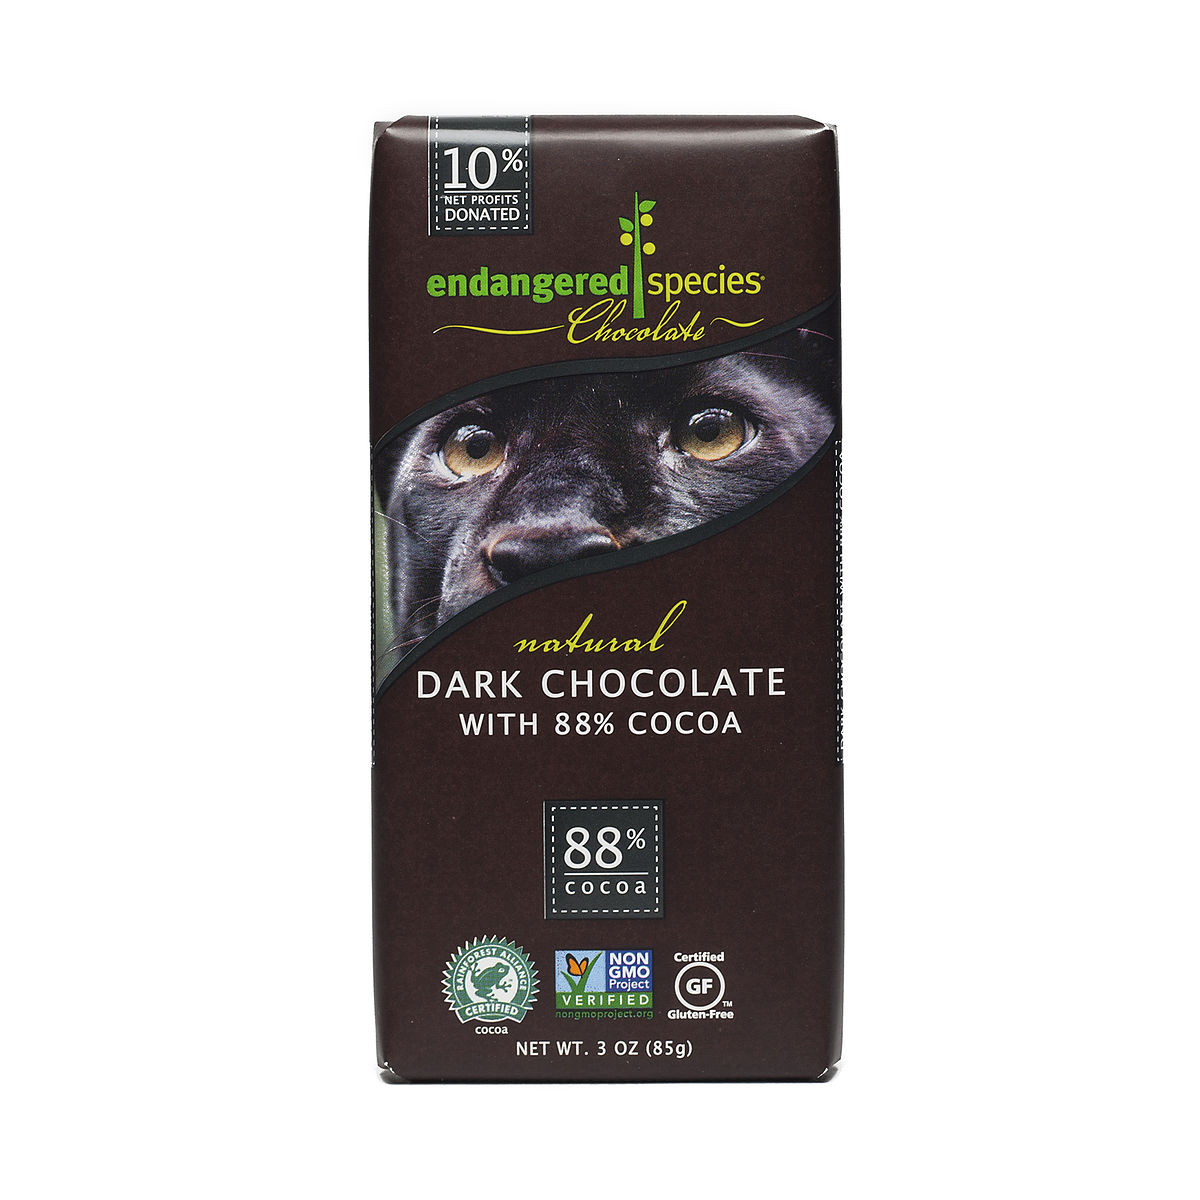 3 oz 88% Cocoa Dark Chocolate, Fair Trade - Thrive Market